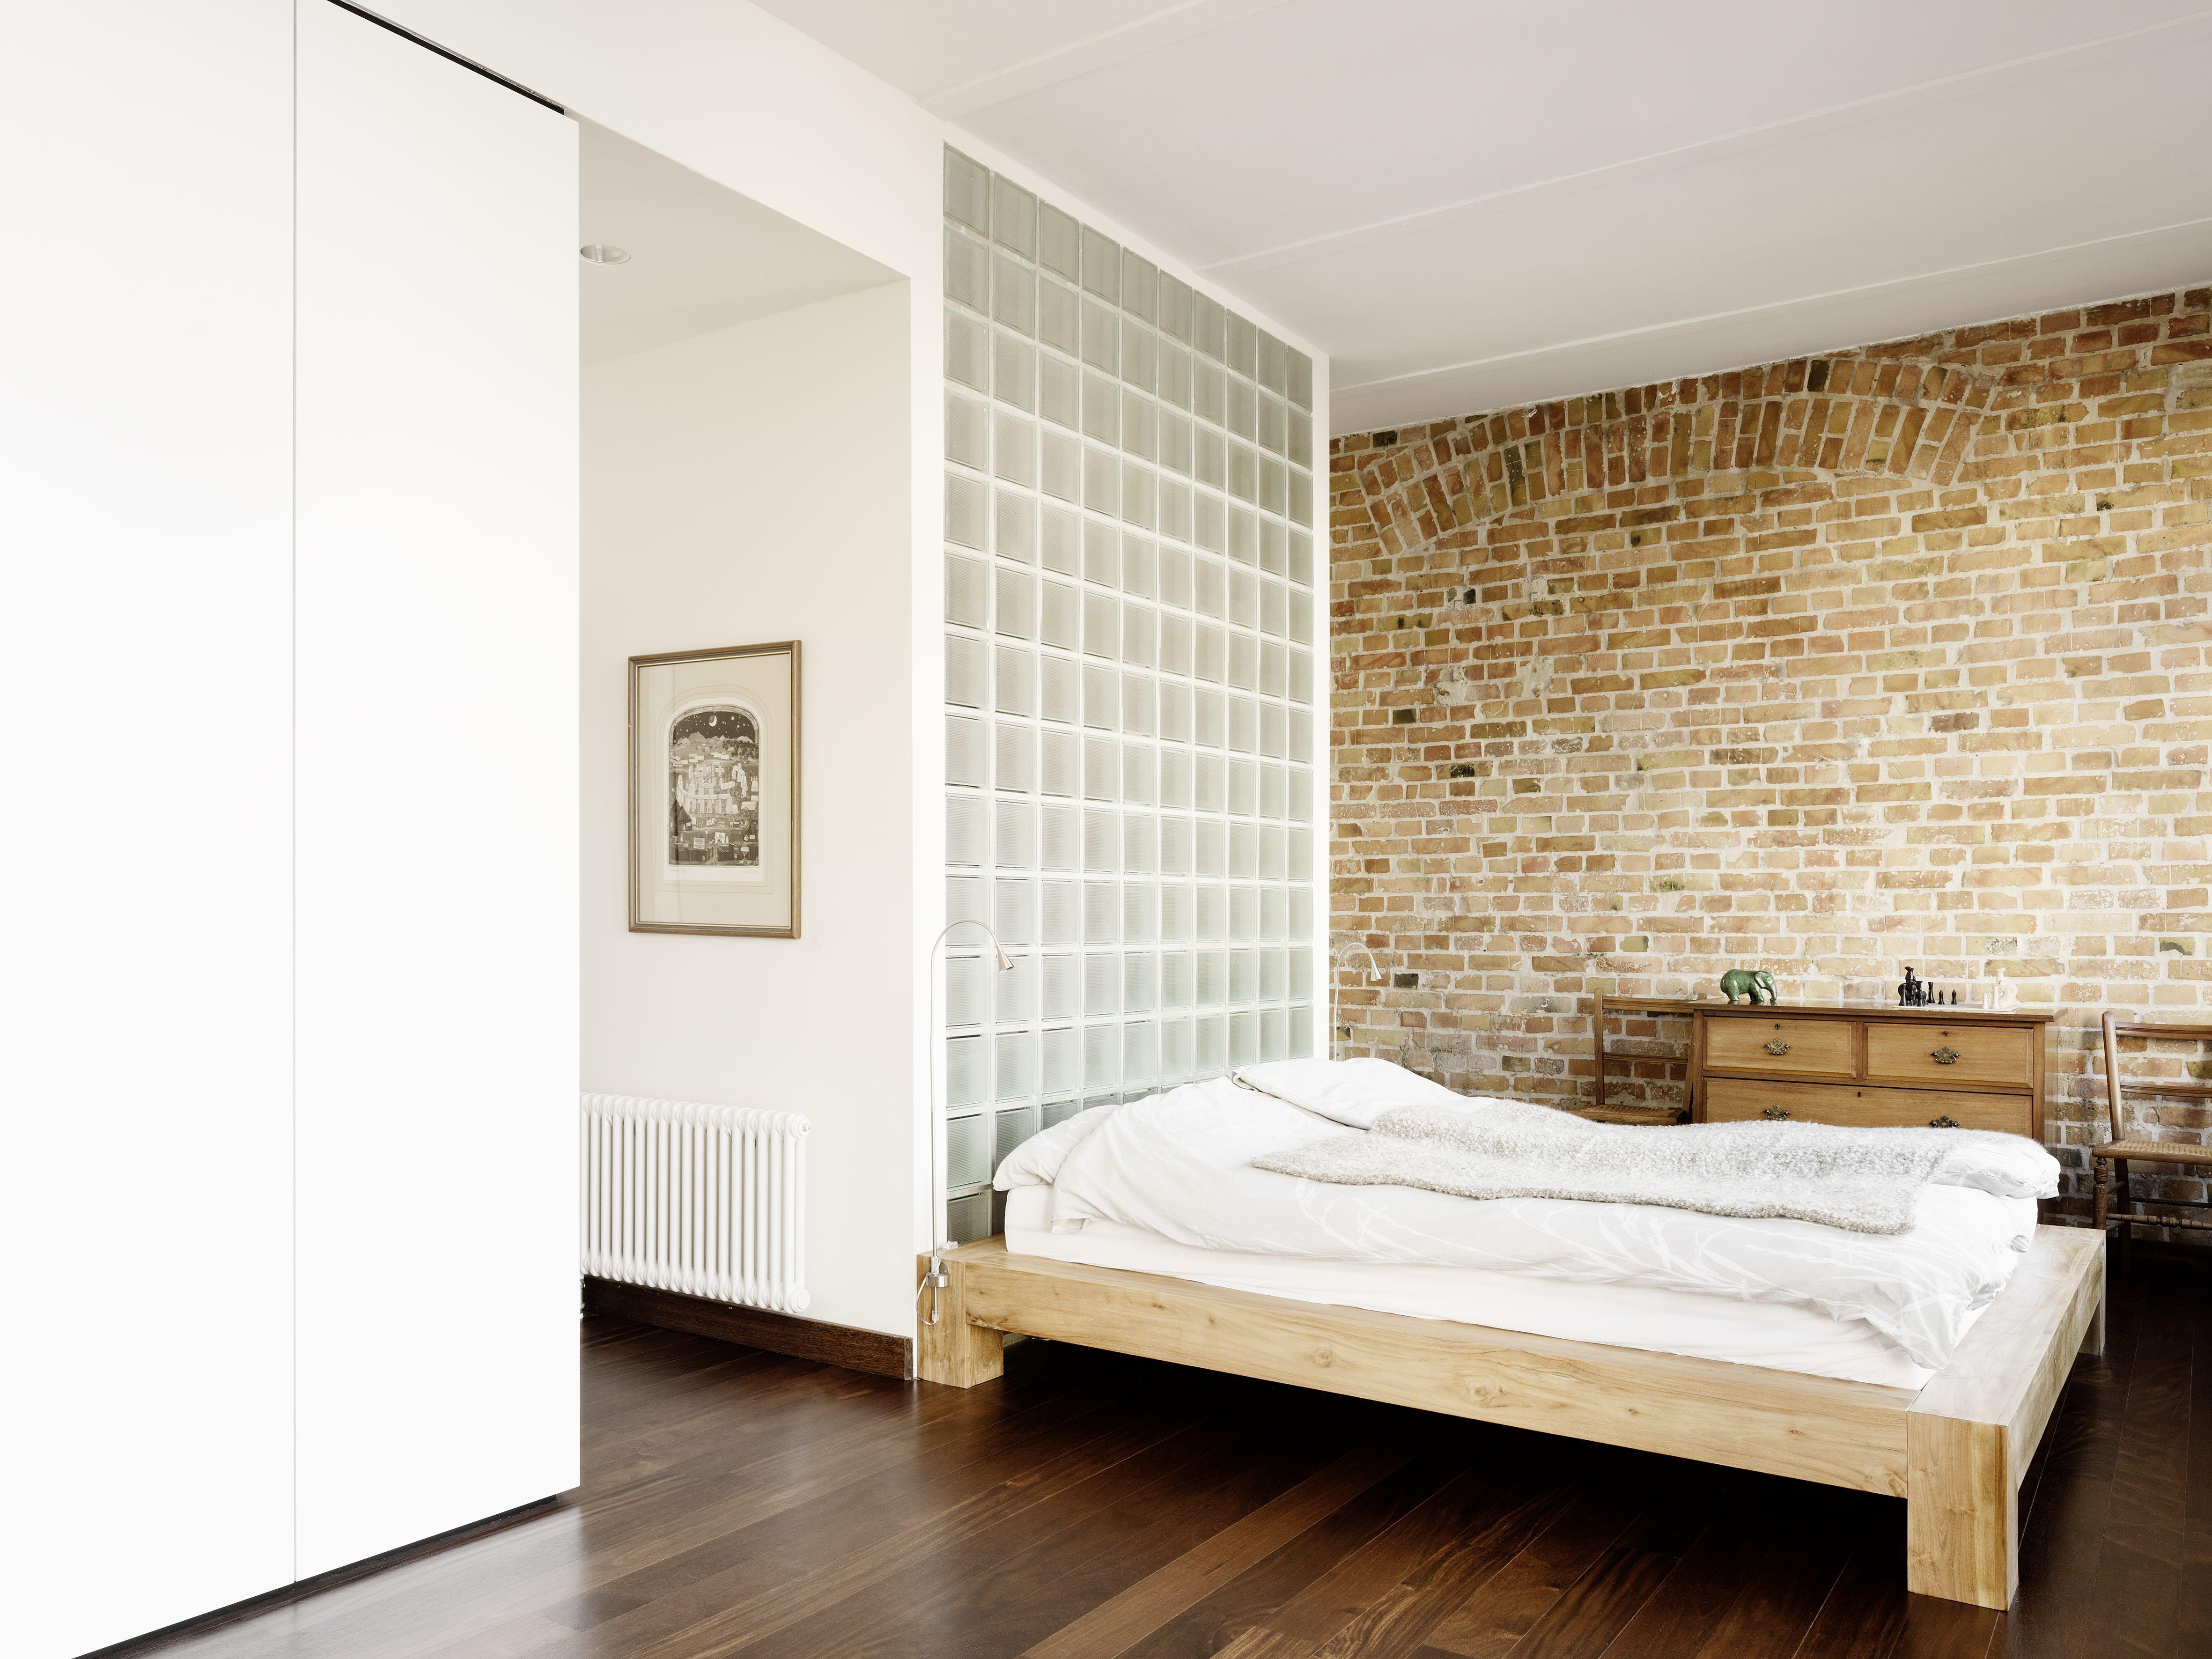 cama a wohnung l westra e berlin. Black Bedroom Furniture Sets. Home Design Ideas